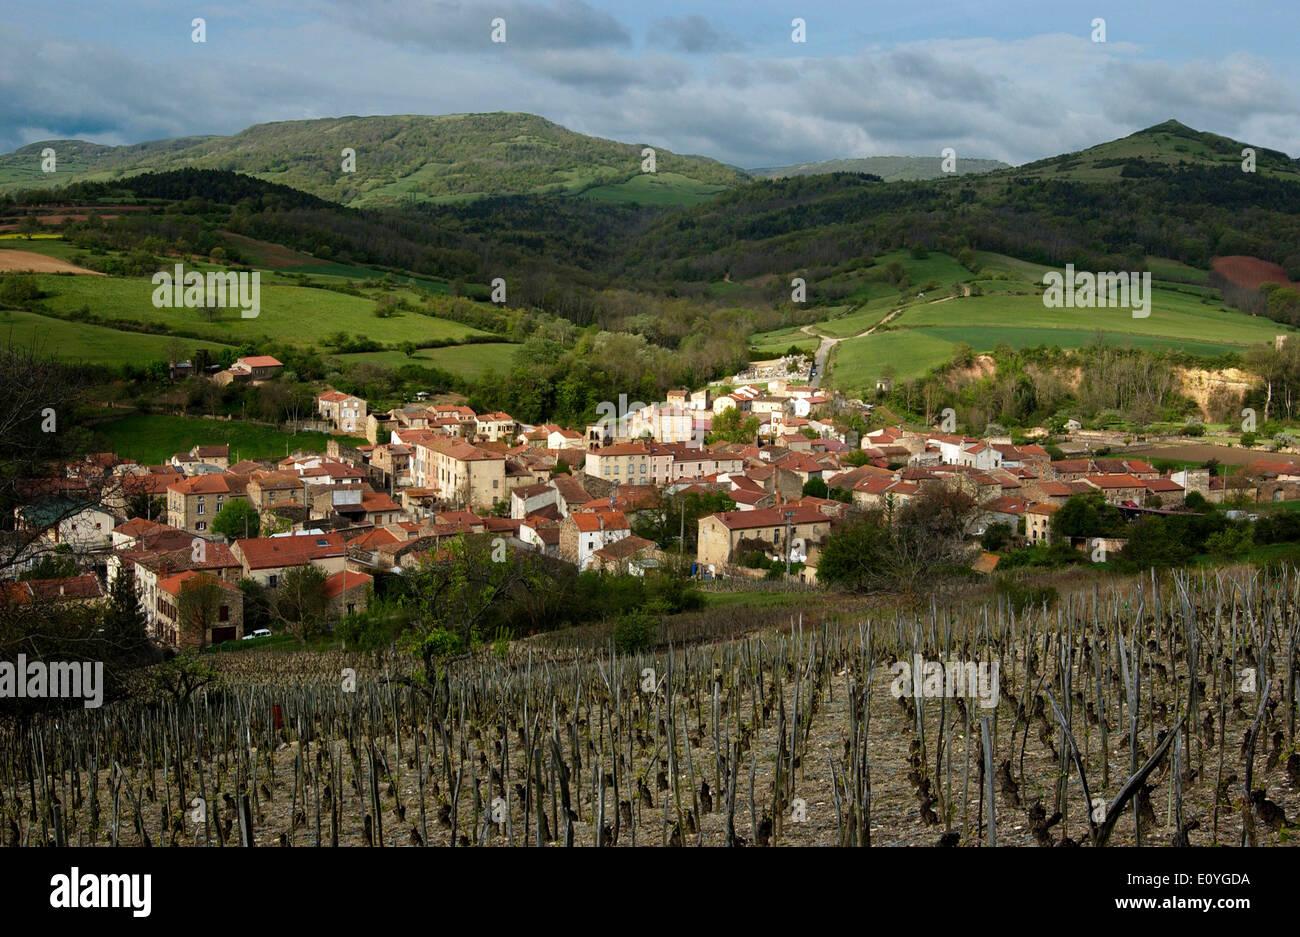 Village of Boudes and vineyard, Puy de Dome, Auvergne, France - Stock Image